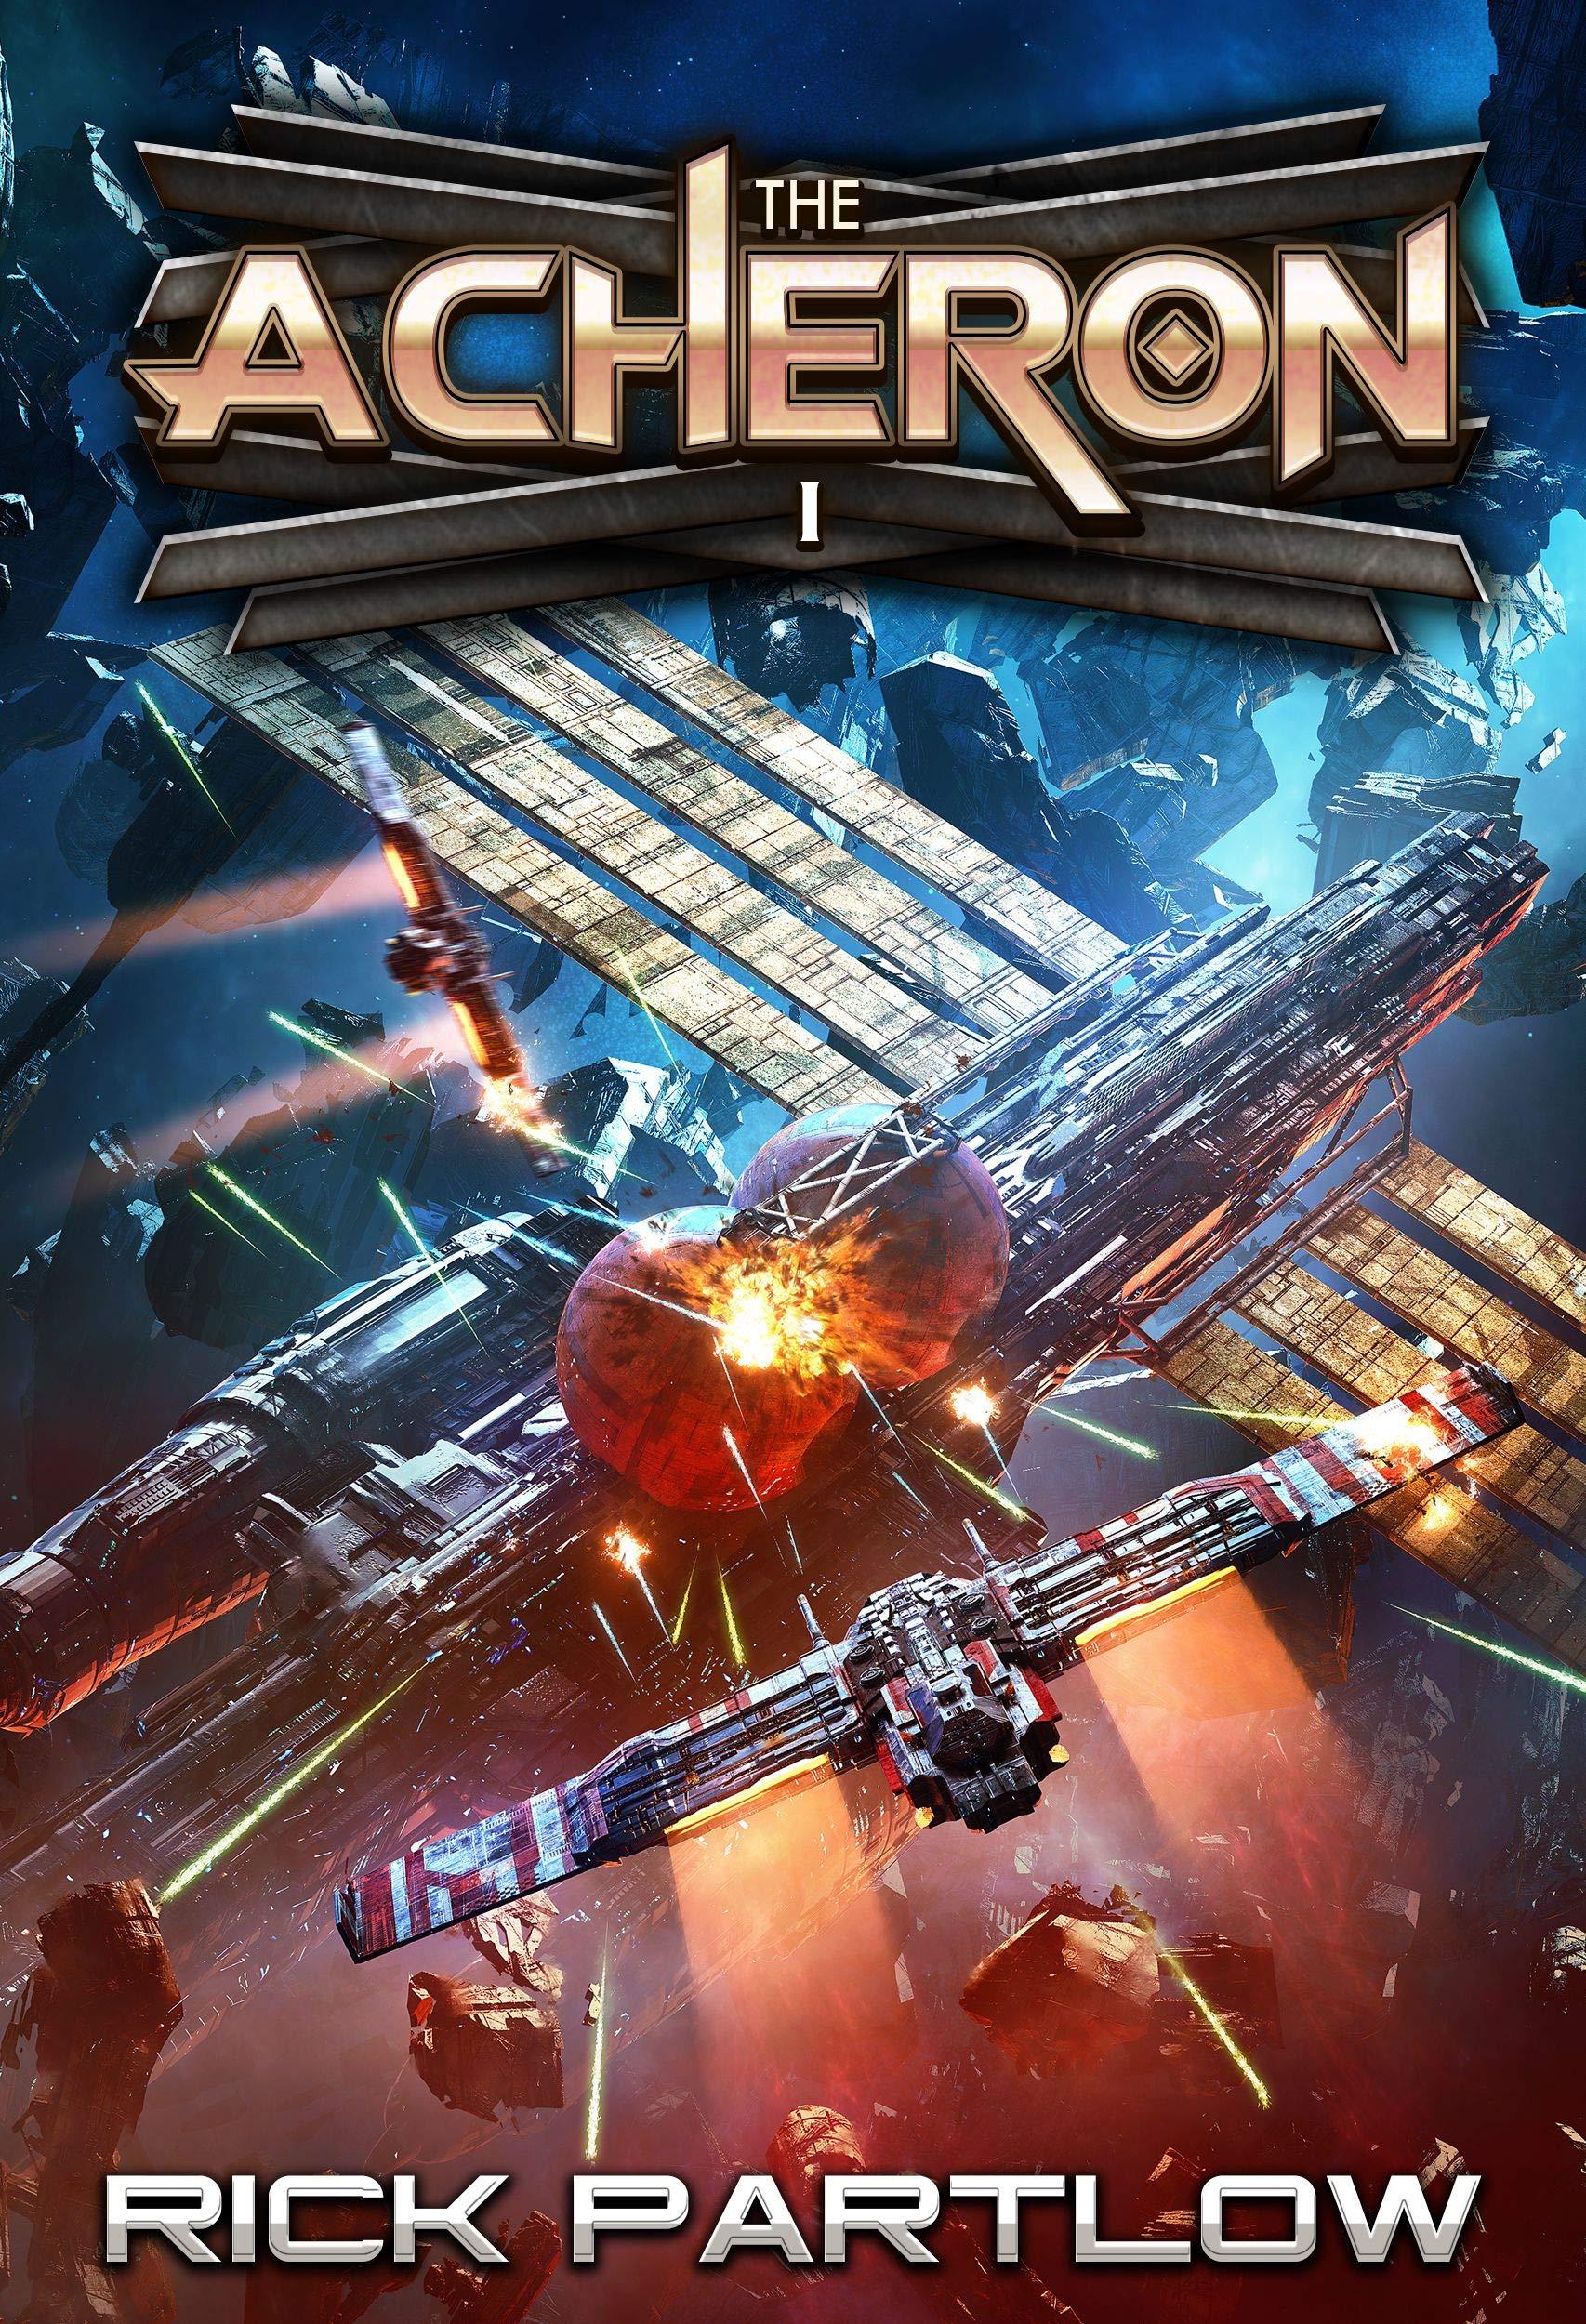 The Acheron: A Military Sci-Fi Series